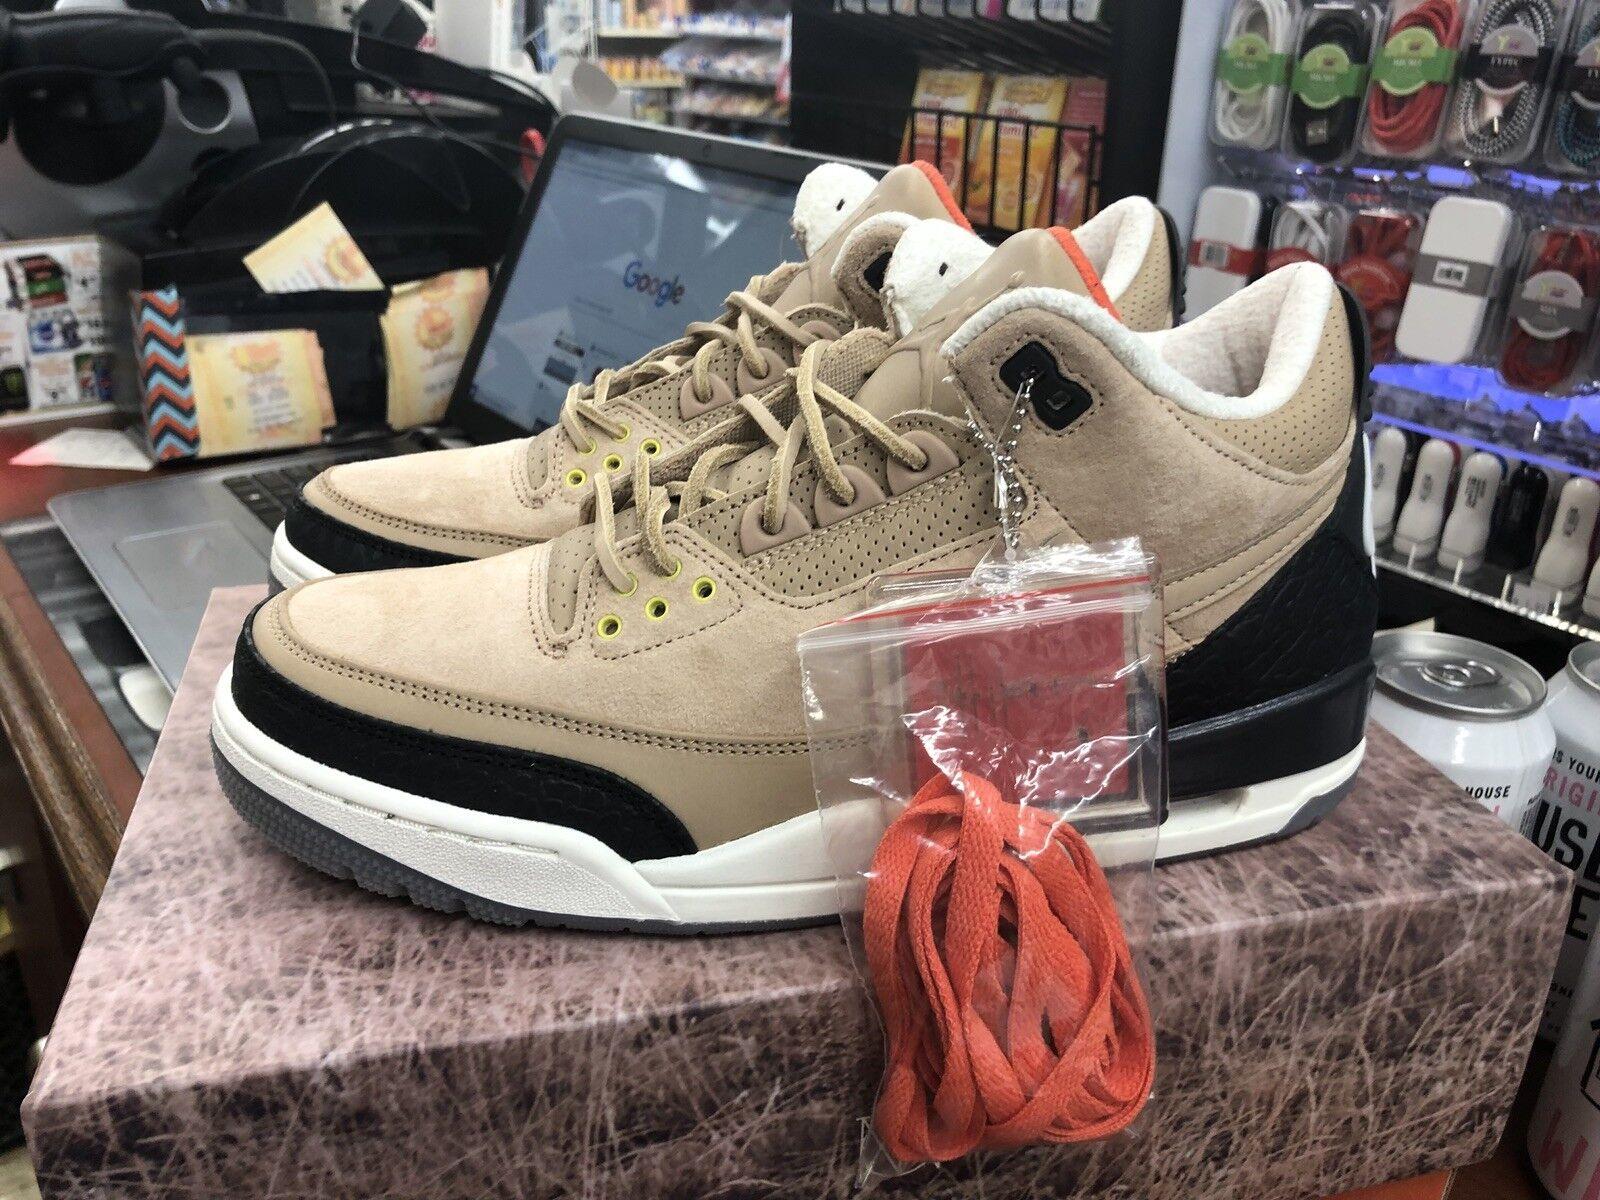 Air Jordan 3 Retro JTH NRG Bio Beige Timberlake Size 9.5